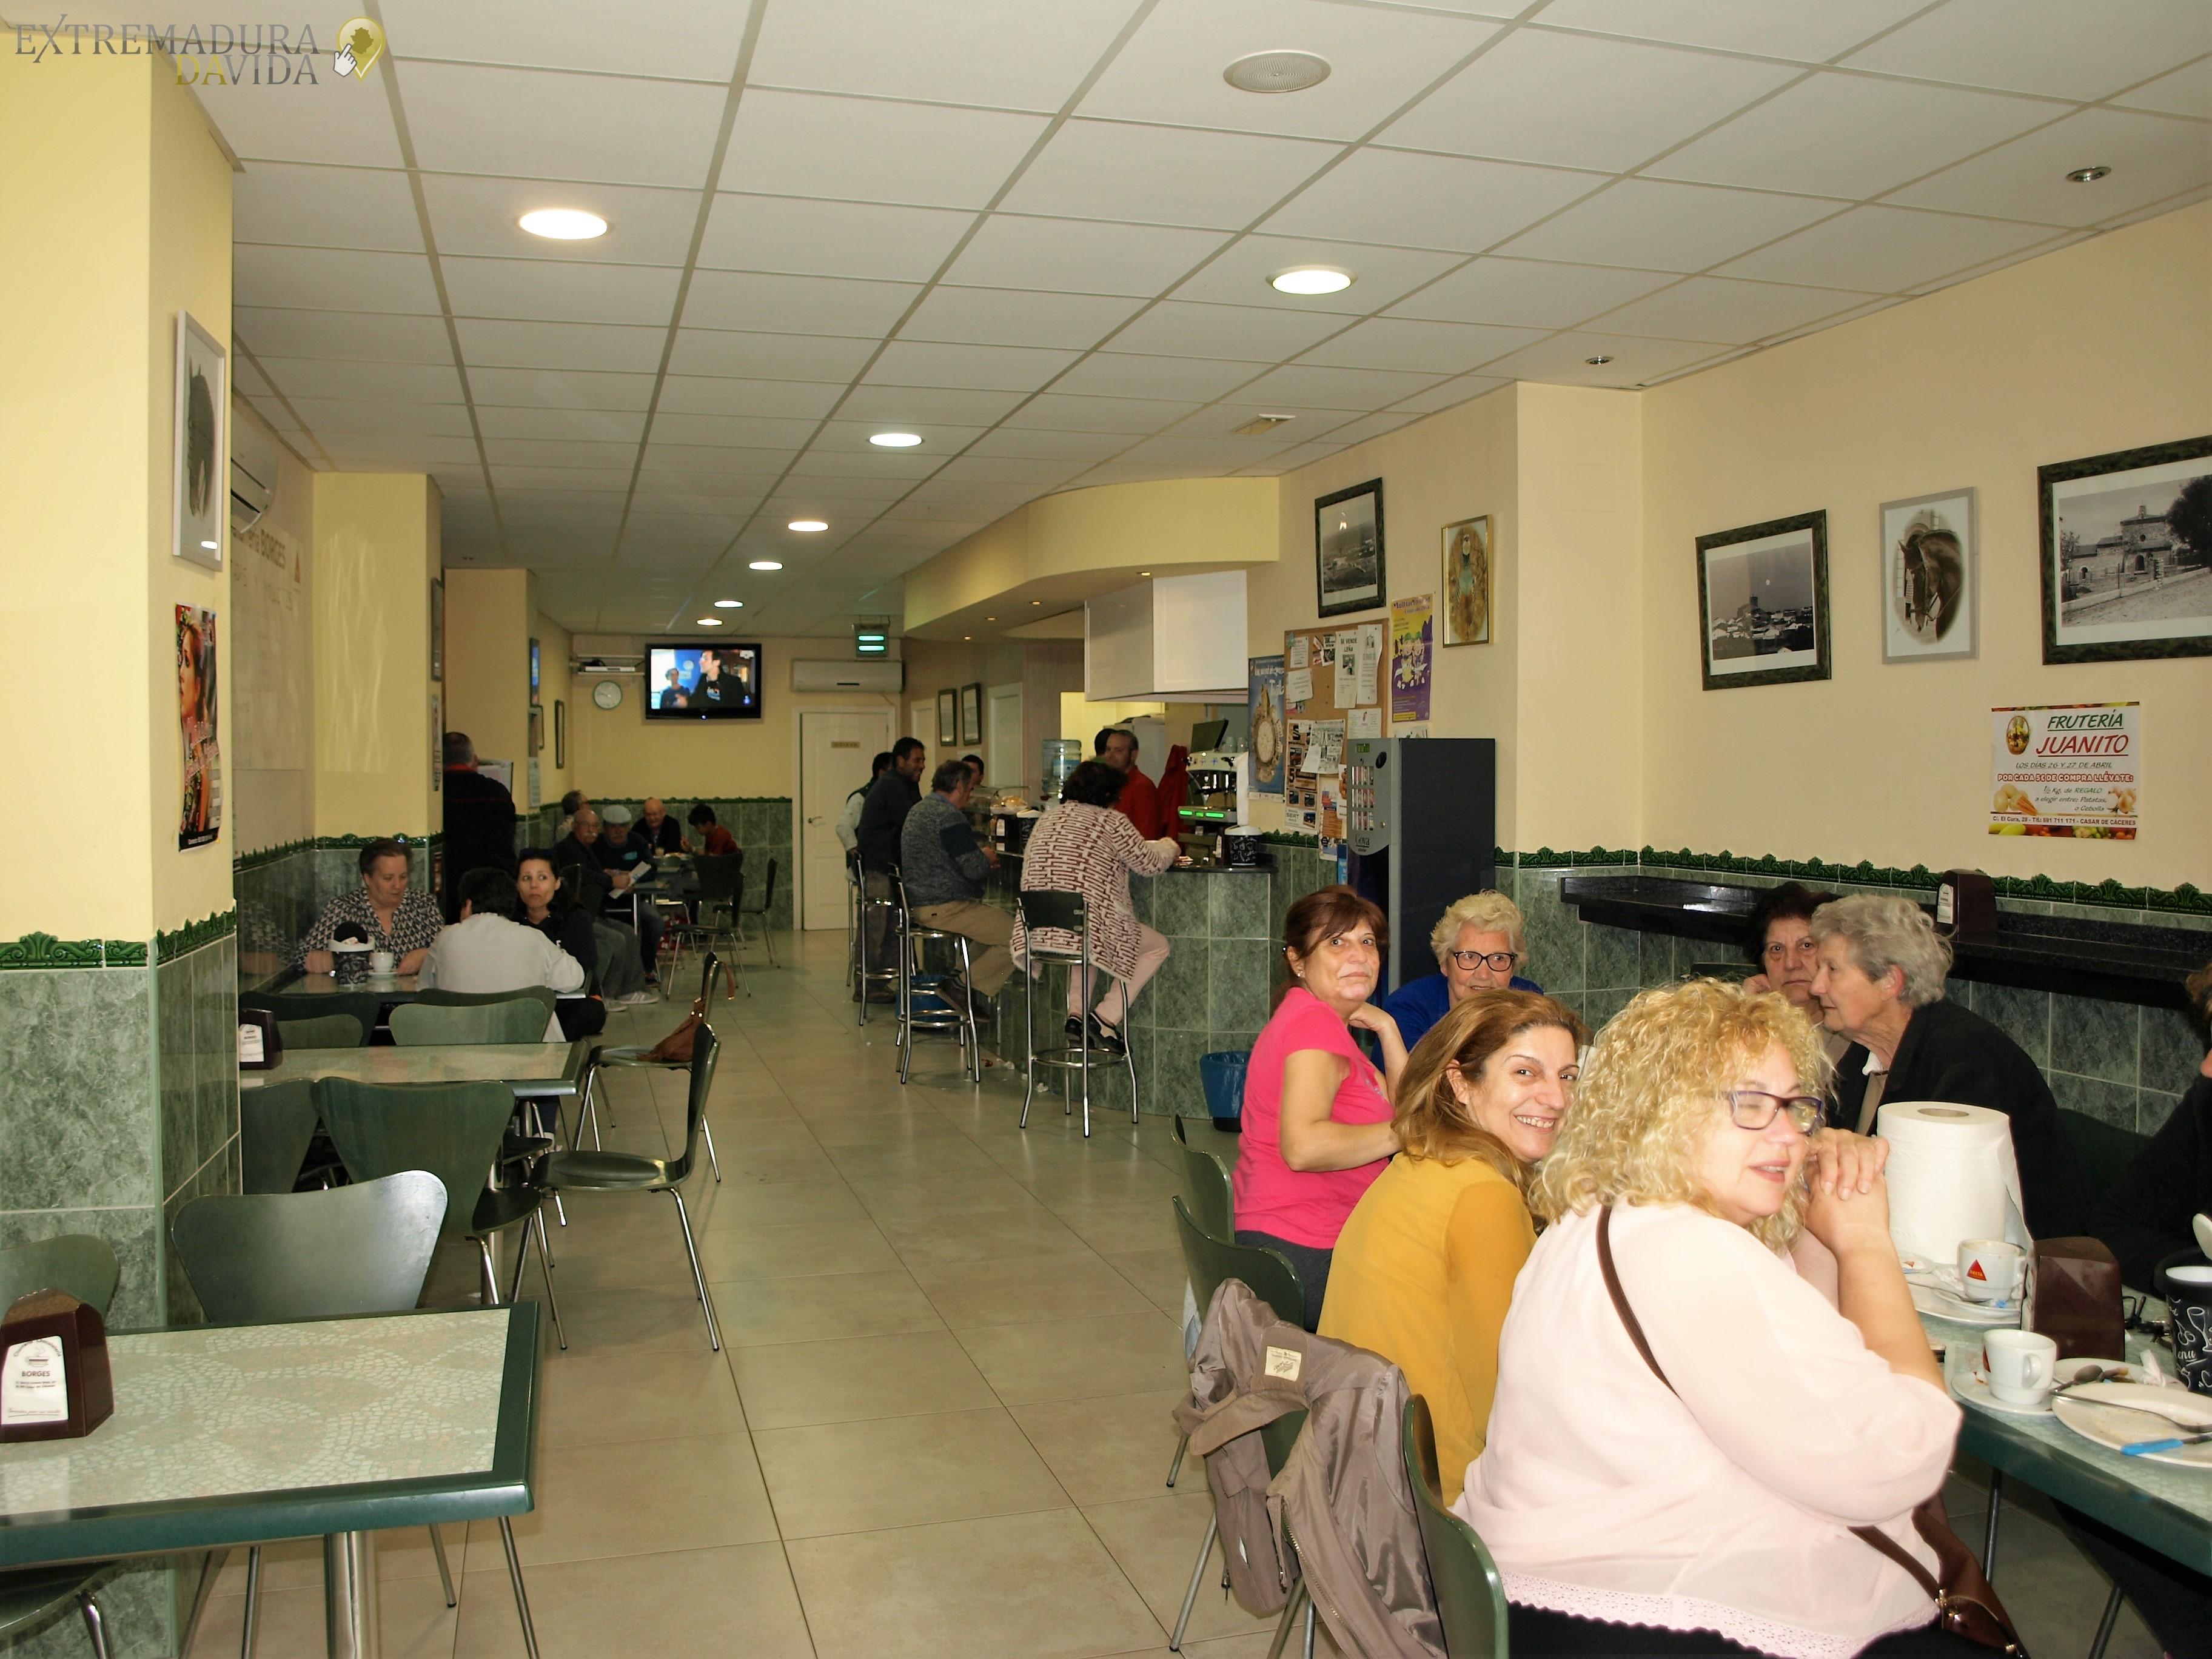 CHURRERIA CHOCOLATERIA EN EL CASAR DE CACERES BORGES